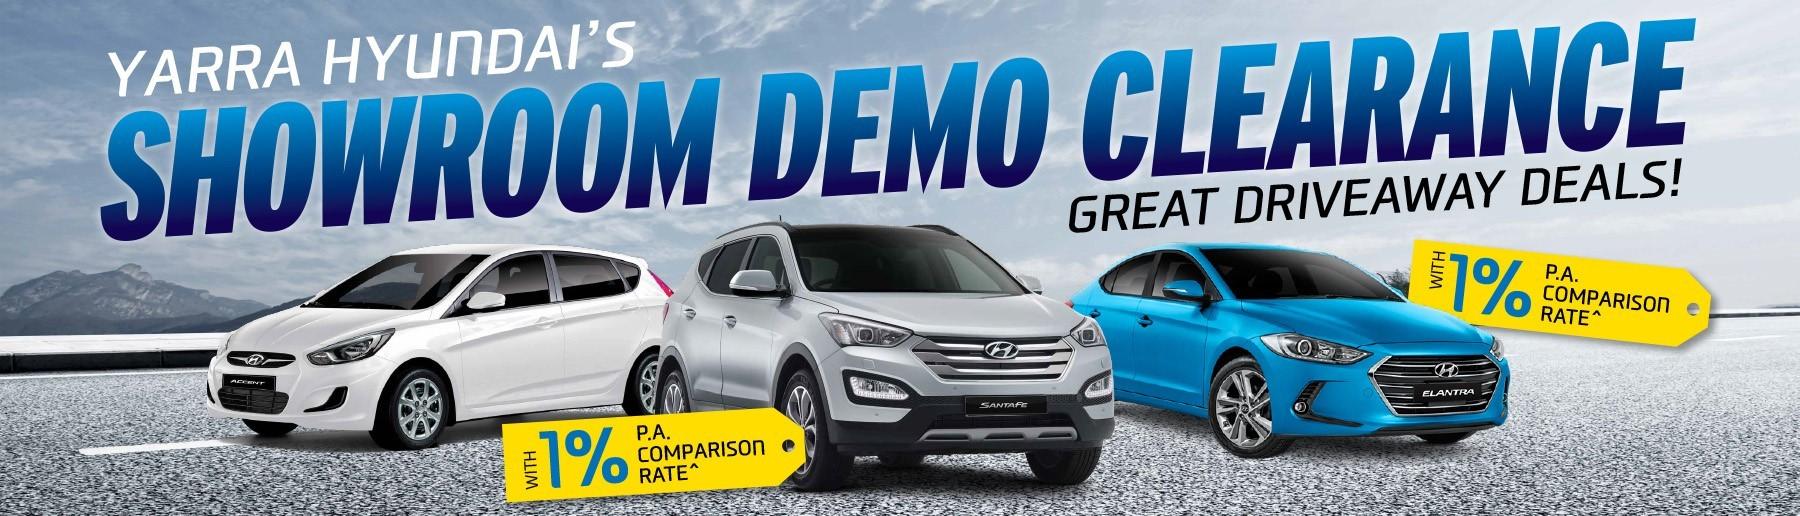 Showroom Demo Clearance at Yarra Hyundai